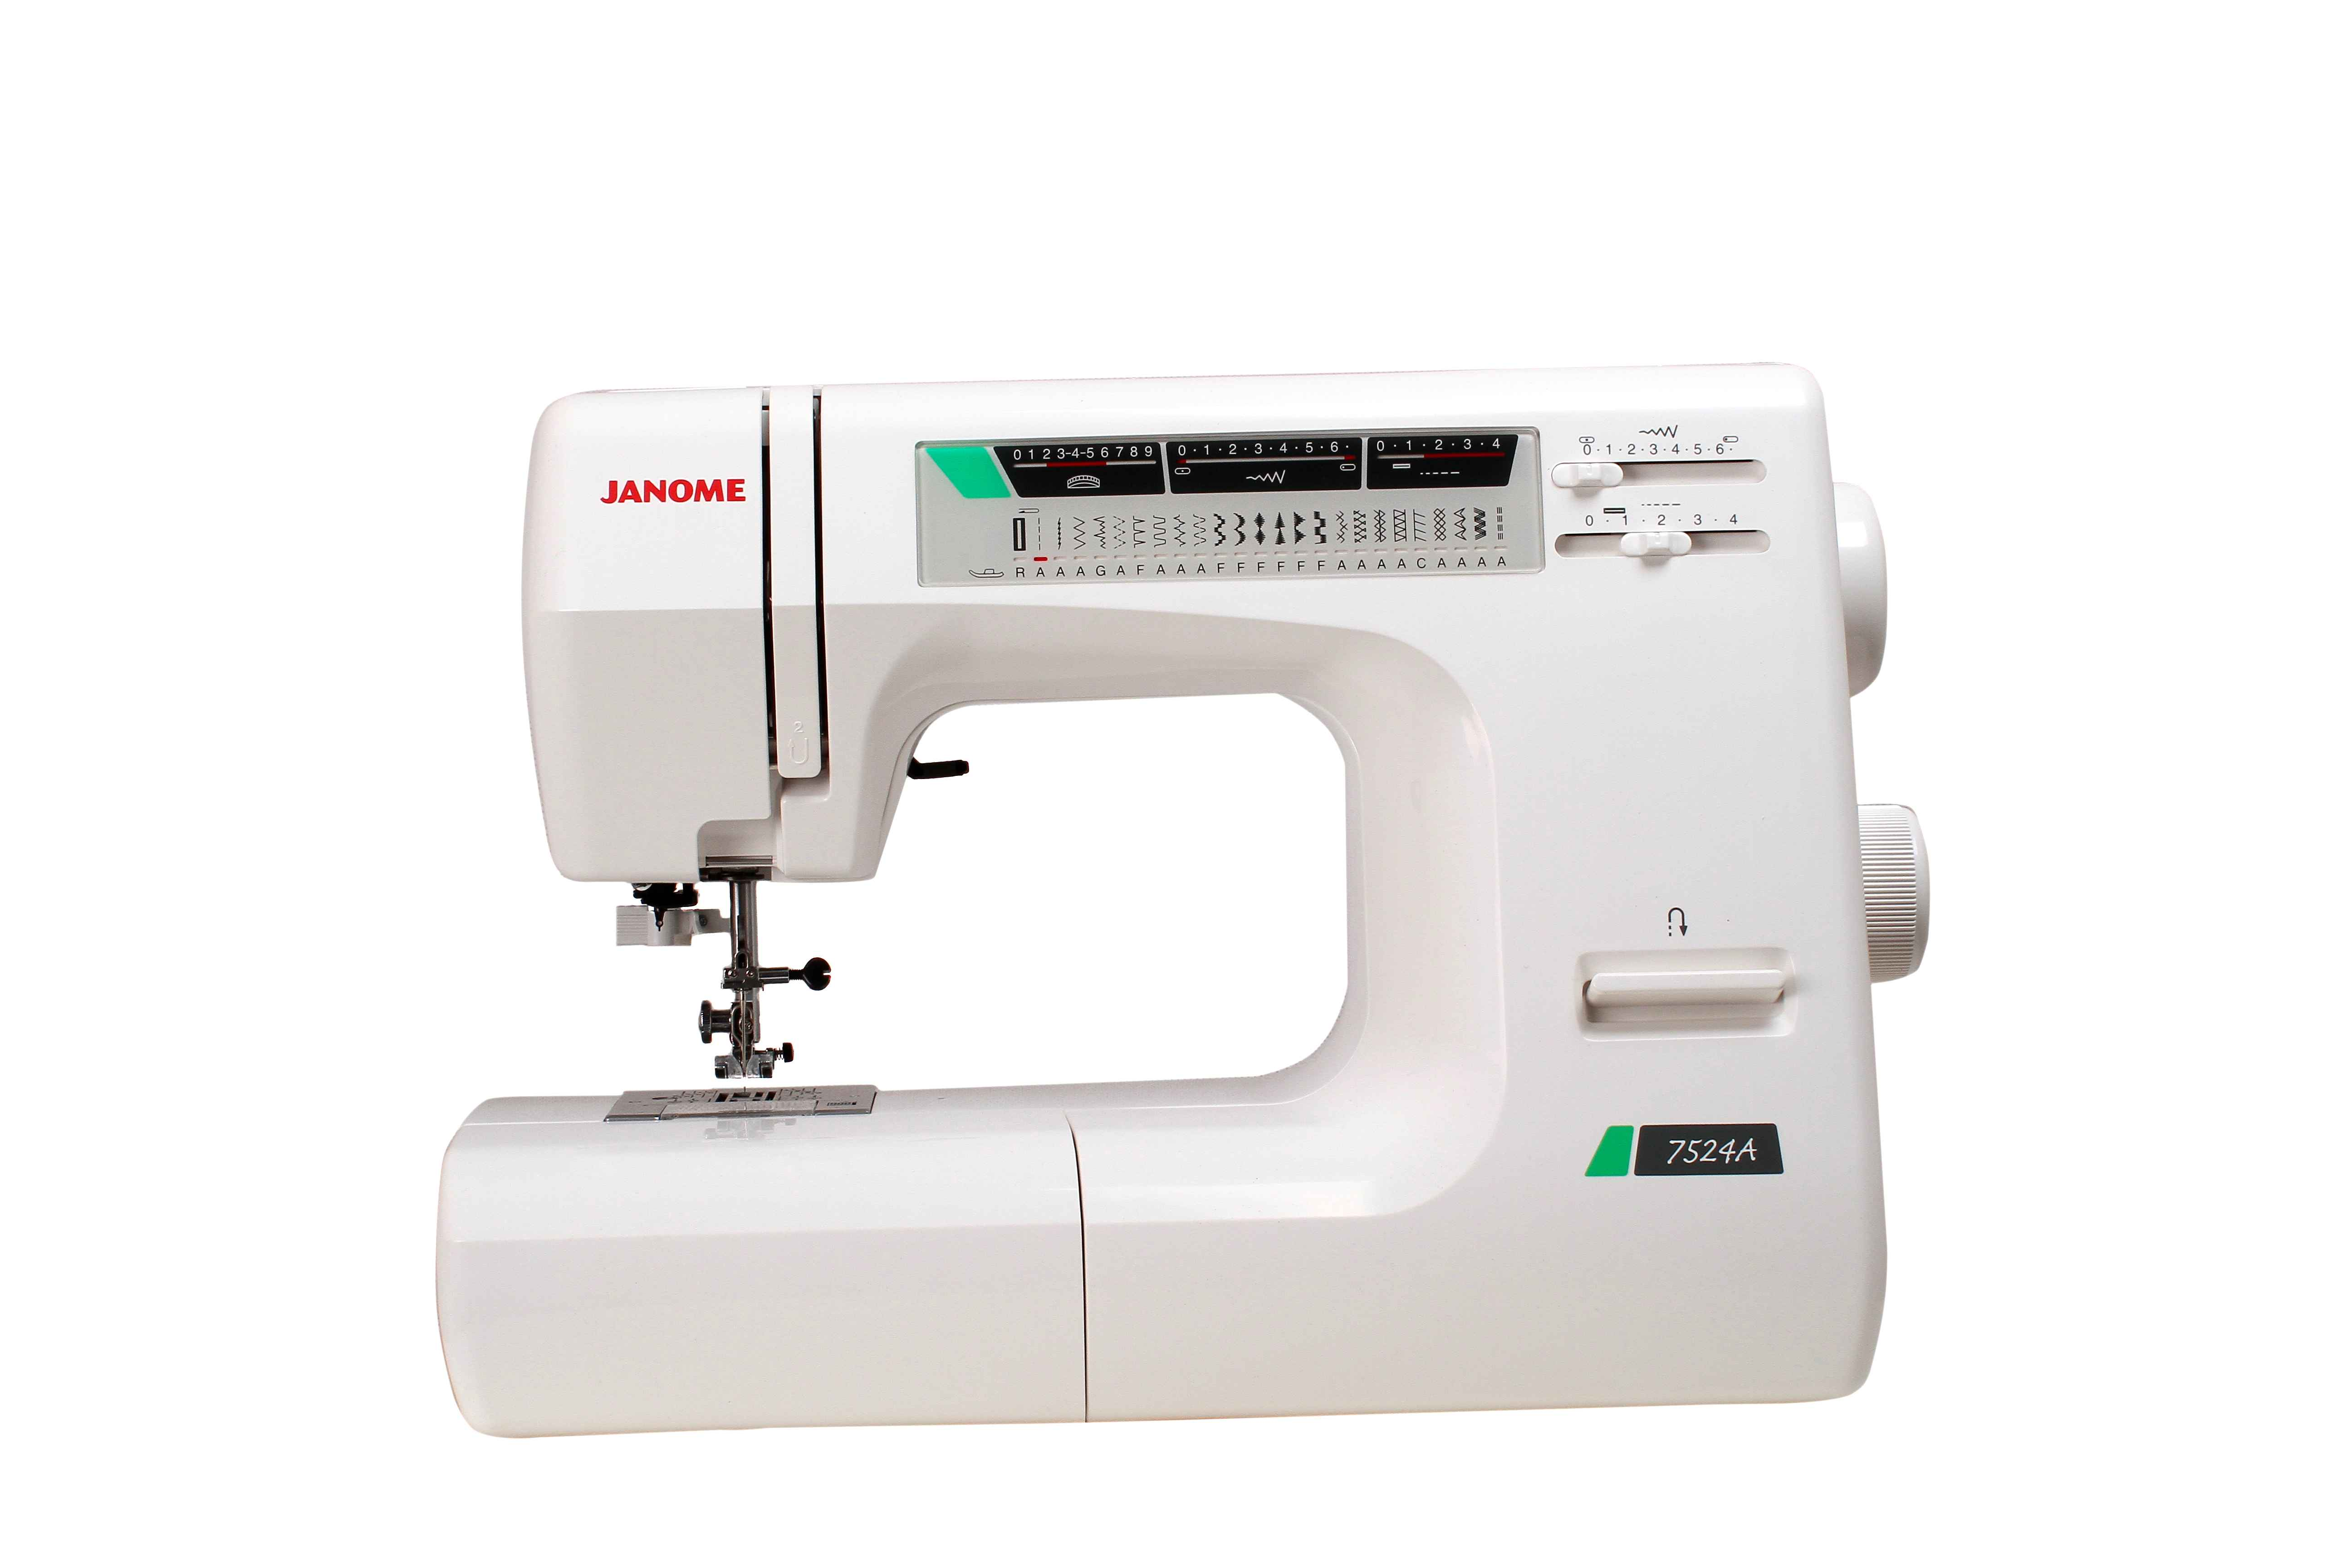 Швейная машина Janome 7524A (жесткий чехол) швейная машина janome decor computer 4030 dc 4030 жесткий чехол